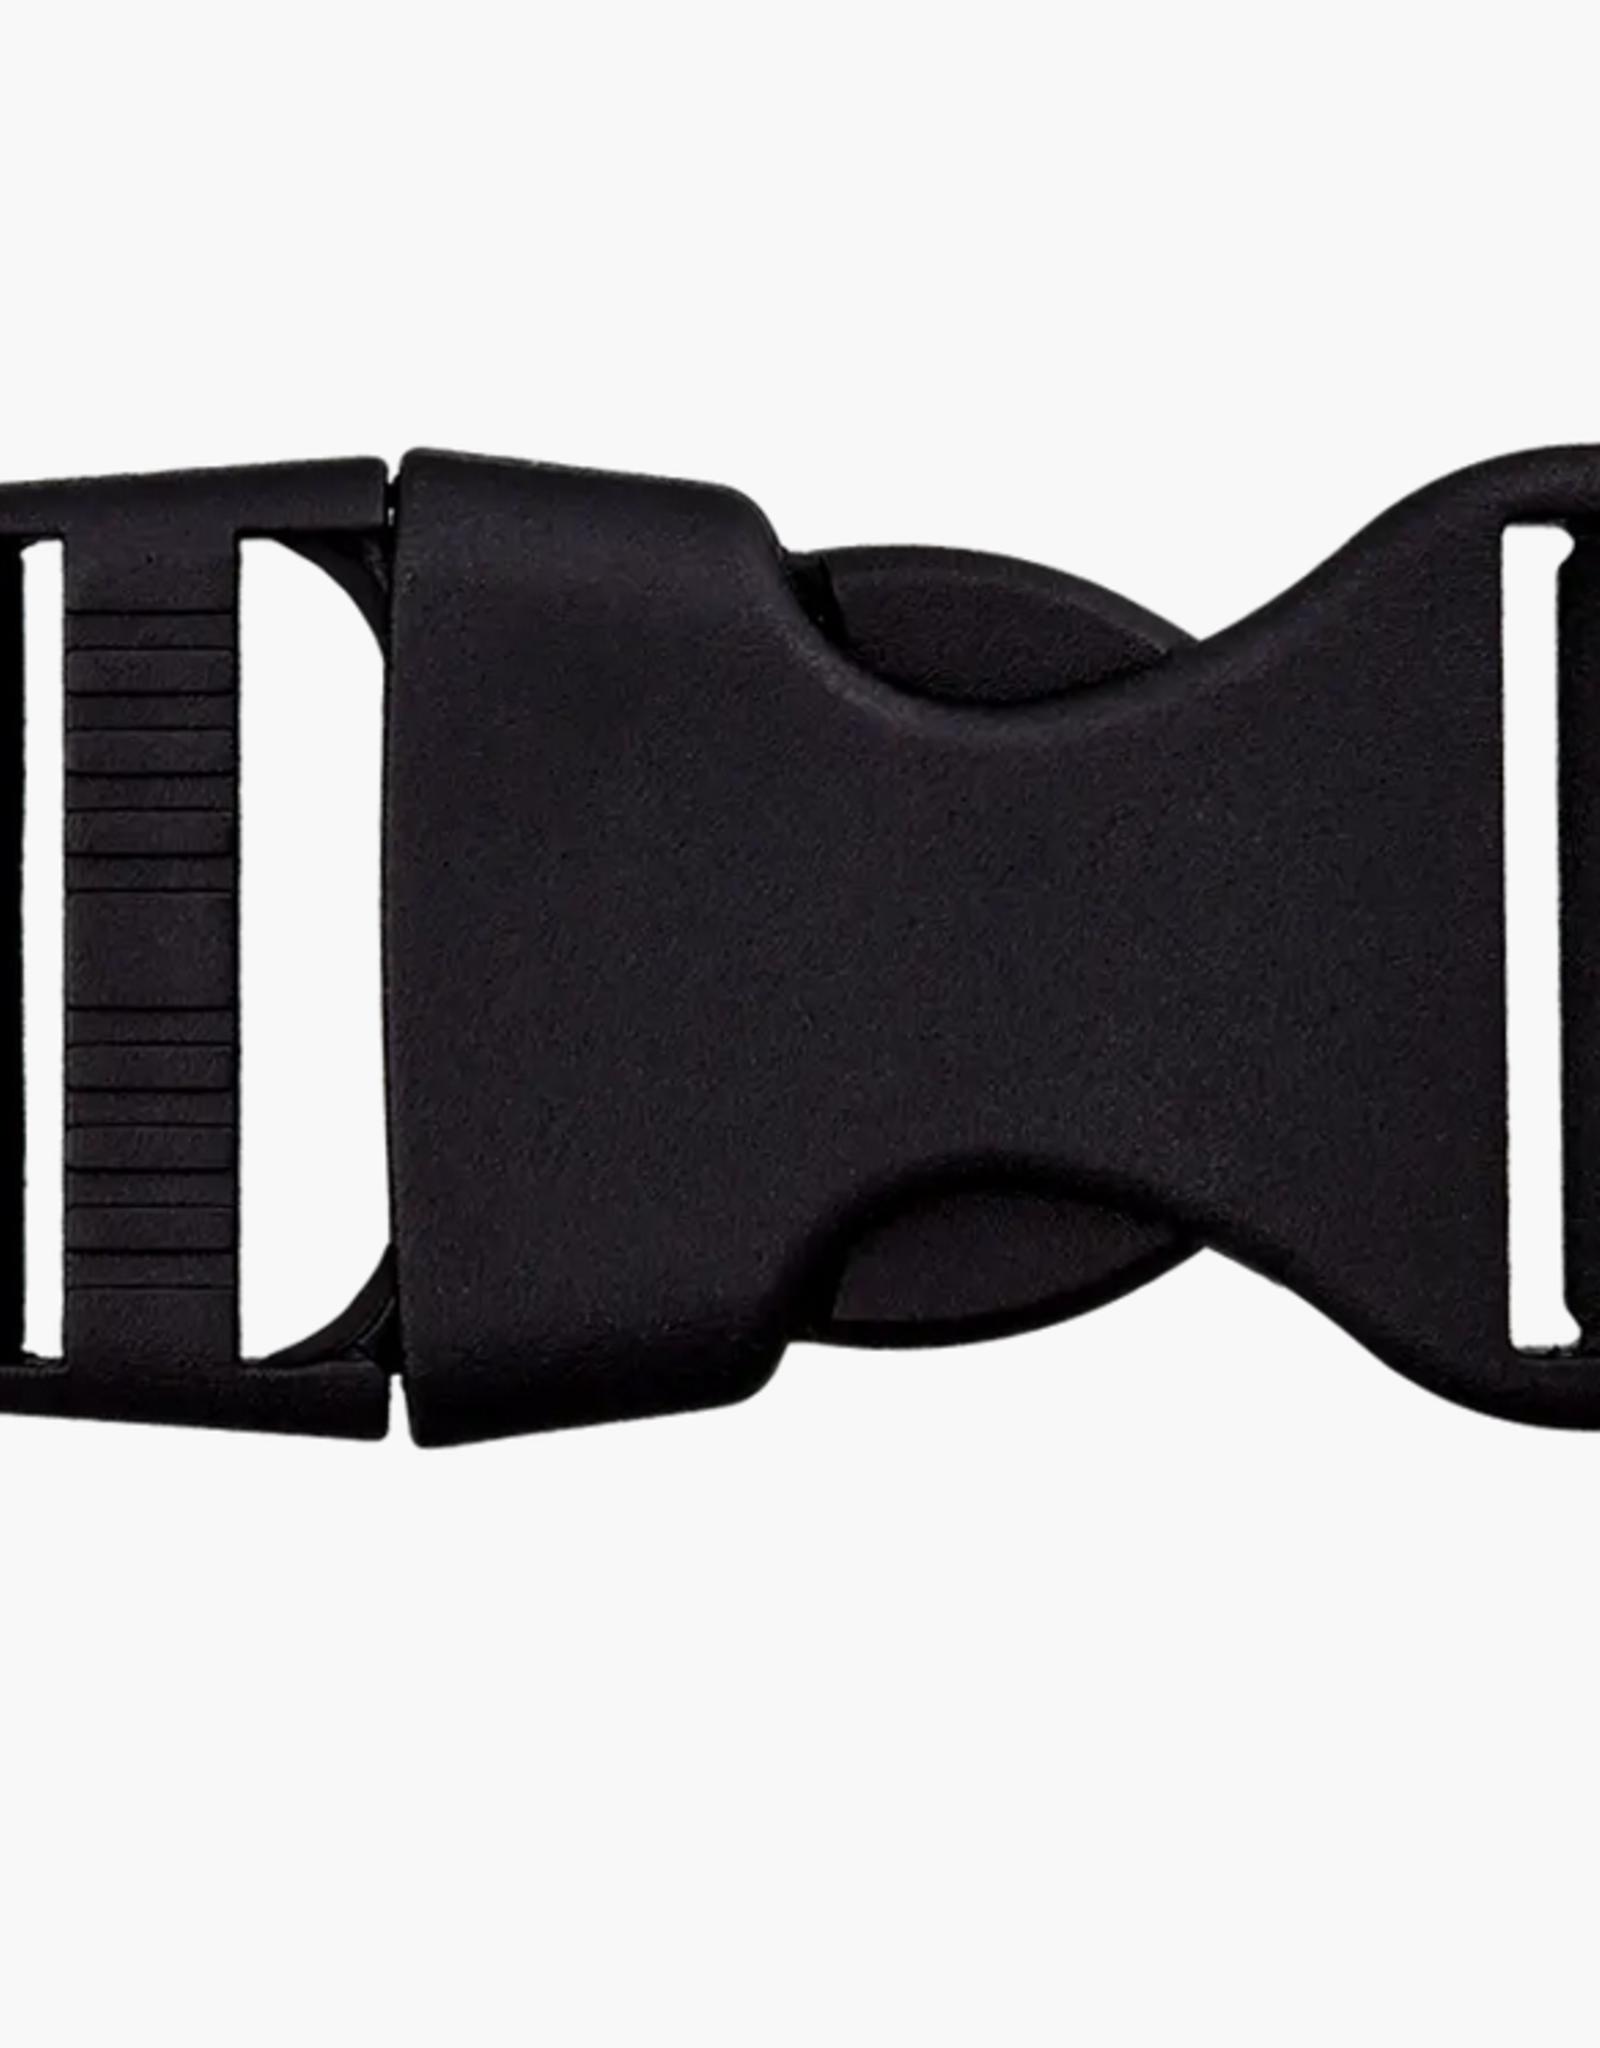 Klikgesp 25mm - Zwart